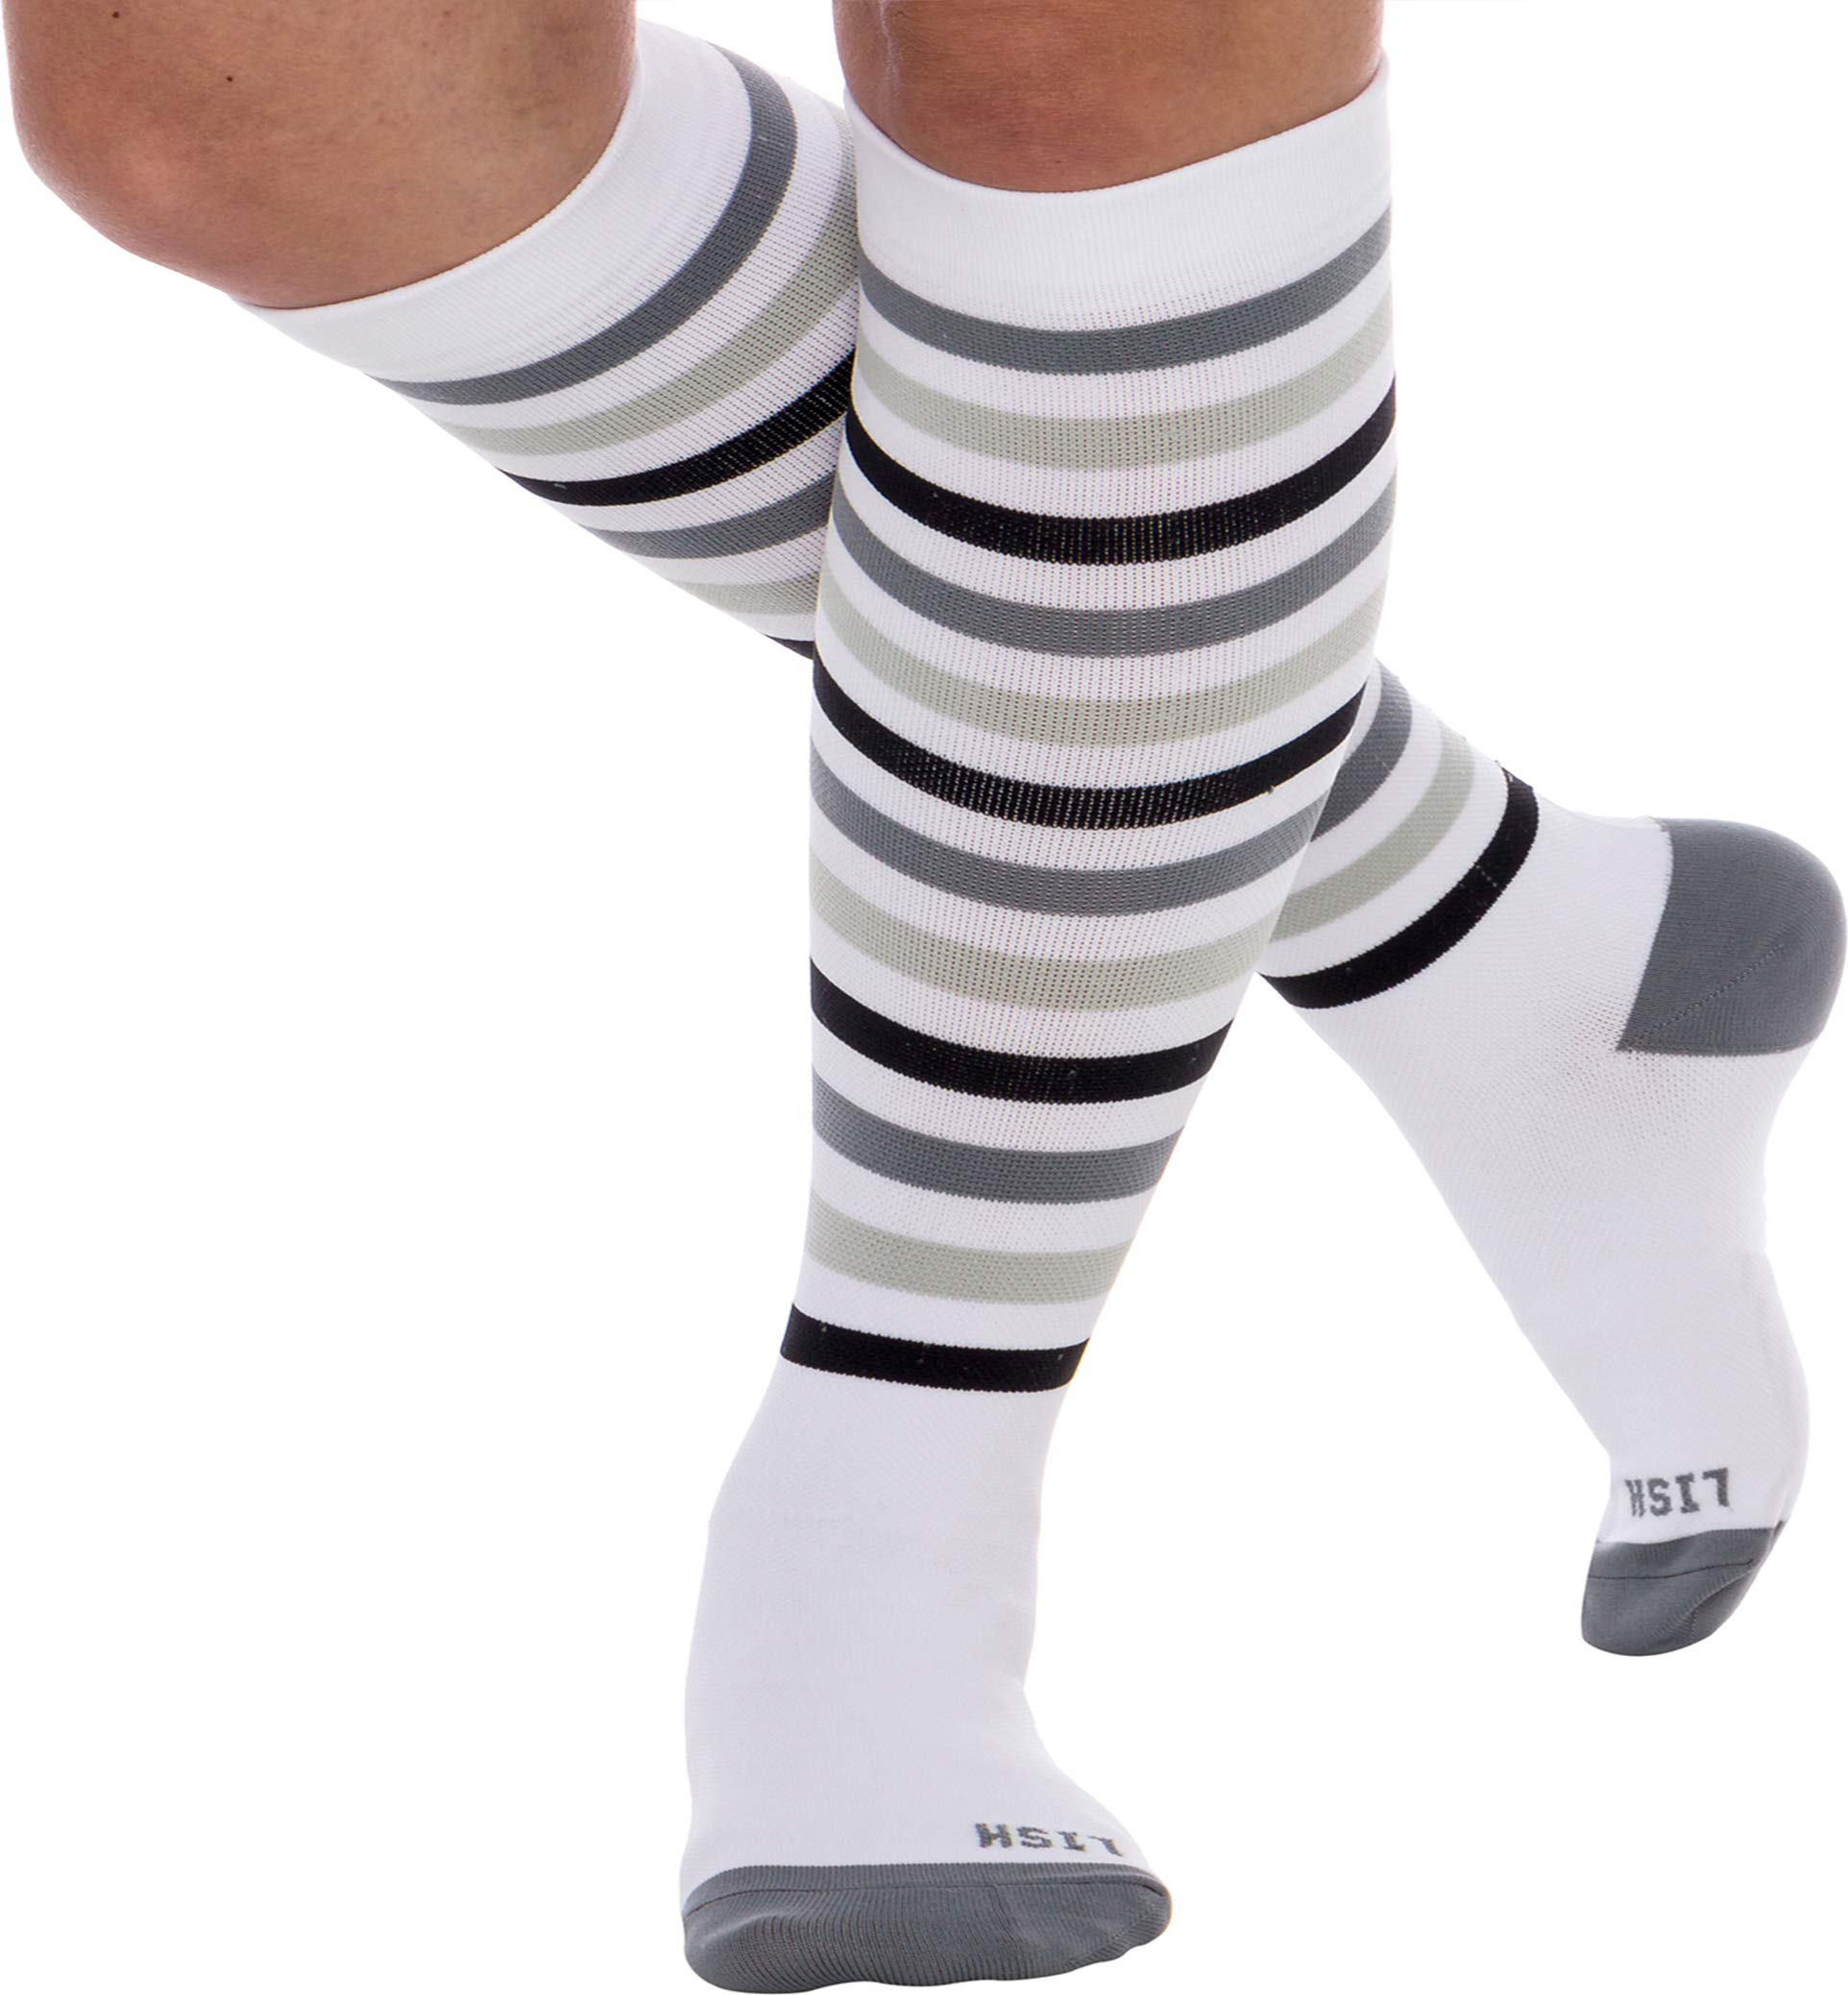 LISH Women's True Stripes Wide Calf Compression Socks - Graduated 15-25 mmHg Knee High Plus Size Support Stockings (Black, M/L)